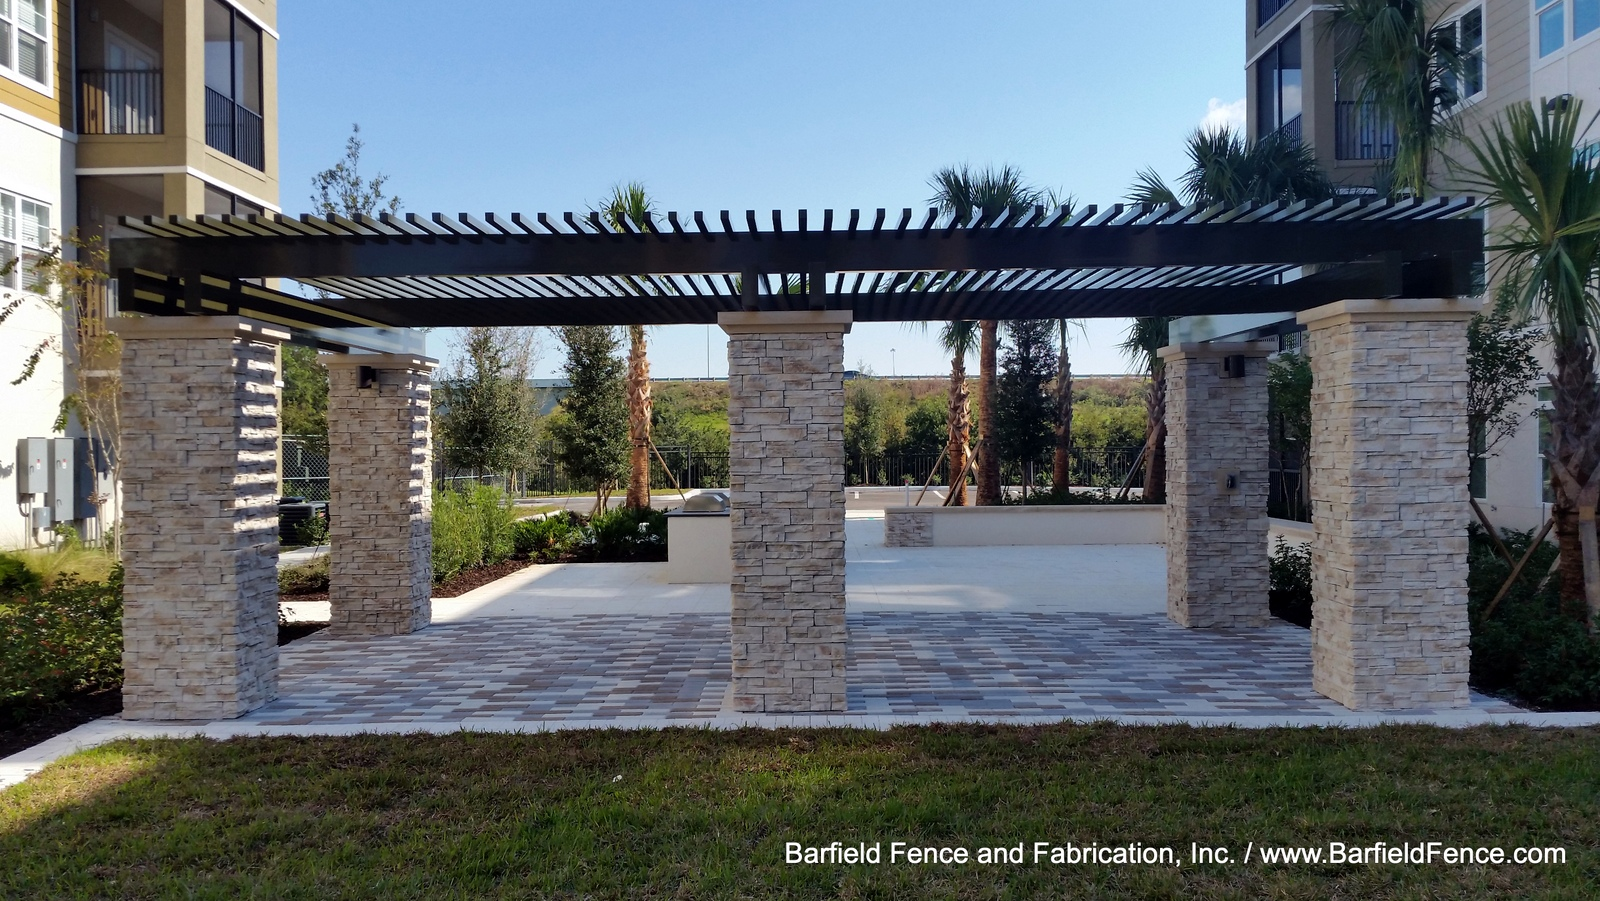 Arbors, Pergolas, and Trellises - Barfield Fence and Fabrication